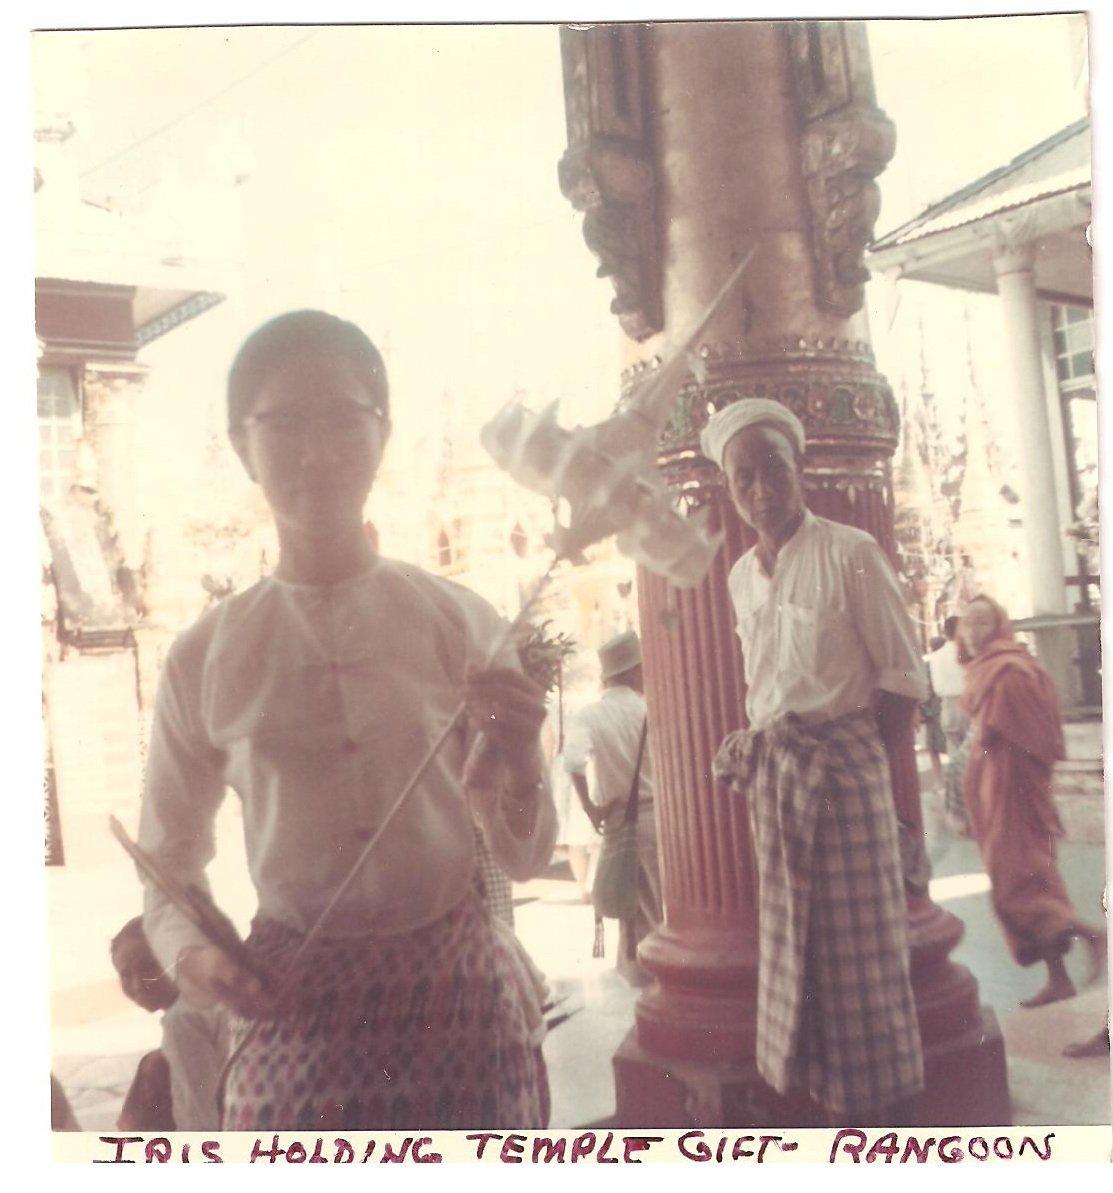 Vintage Photograph Burma Woman Holding Temple Gift Rangoon 1968 Myanmar